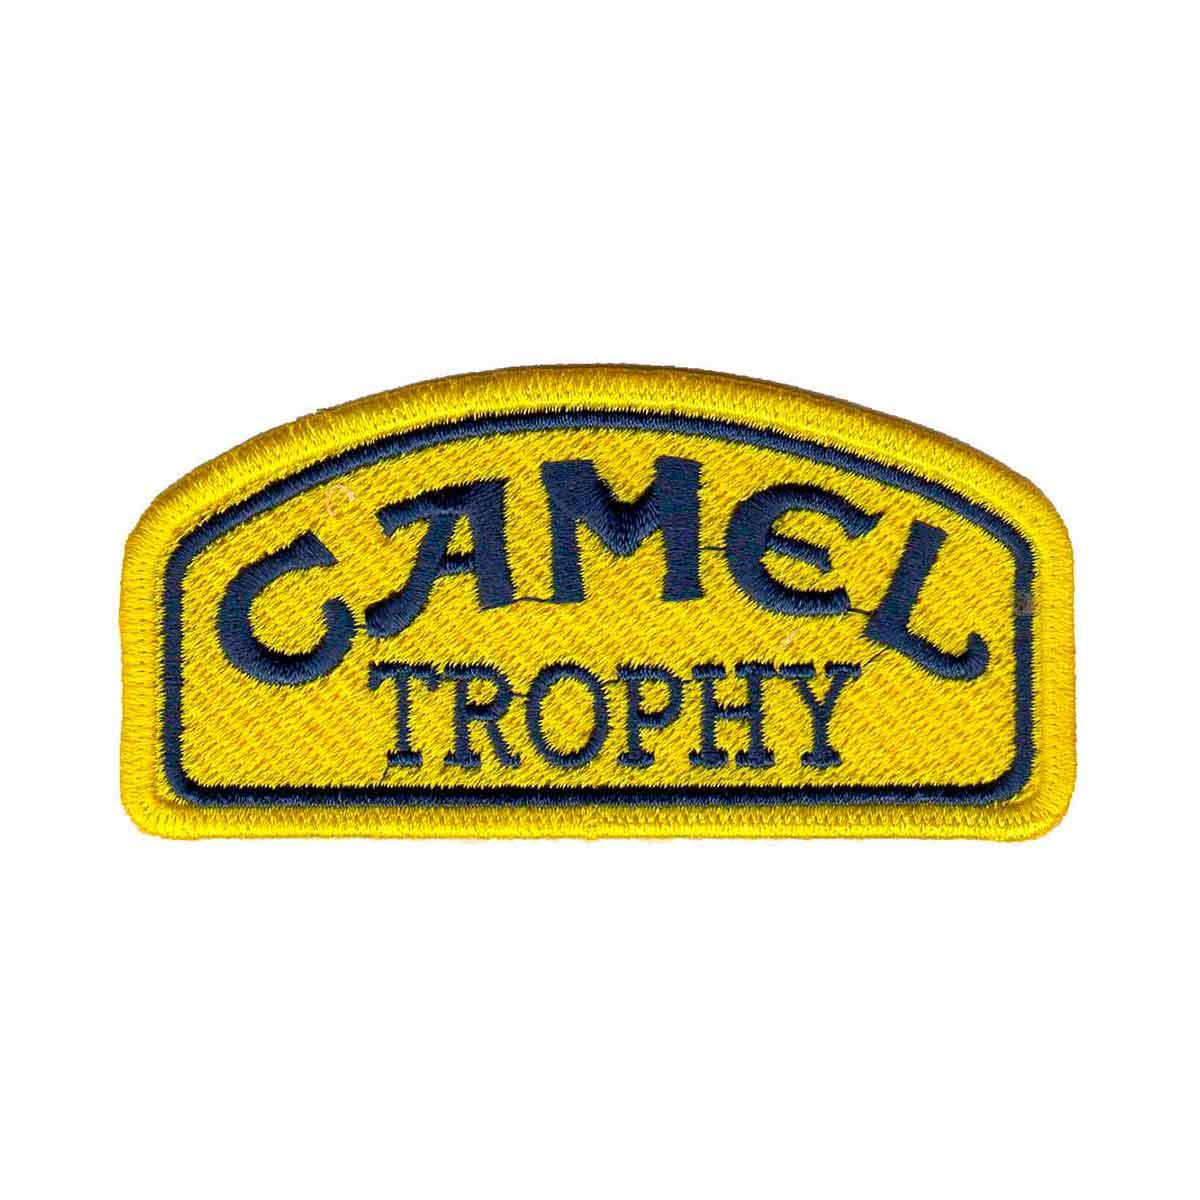 Patch Bordado - Logo Competiçao Camel Trophy AD30017-399  - Talysmã Bordados